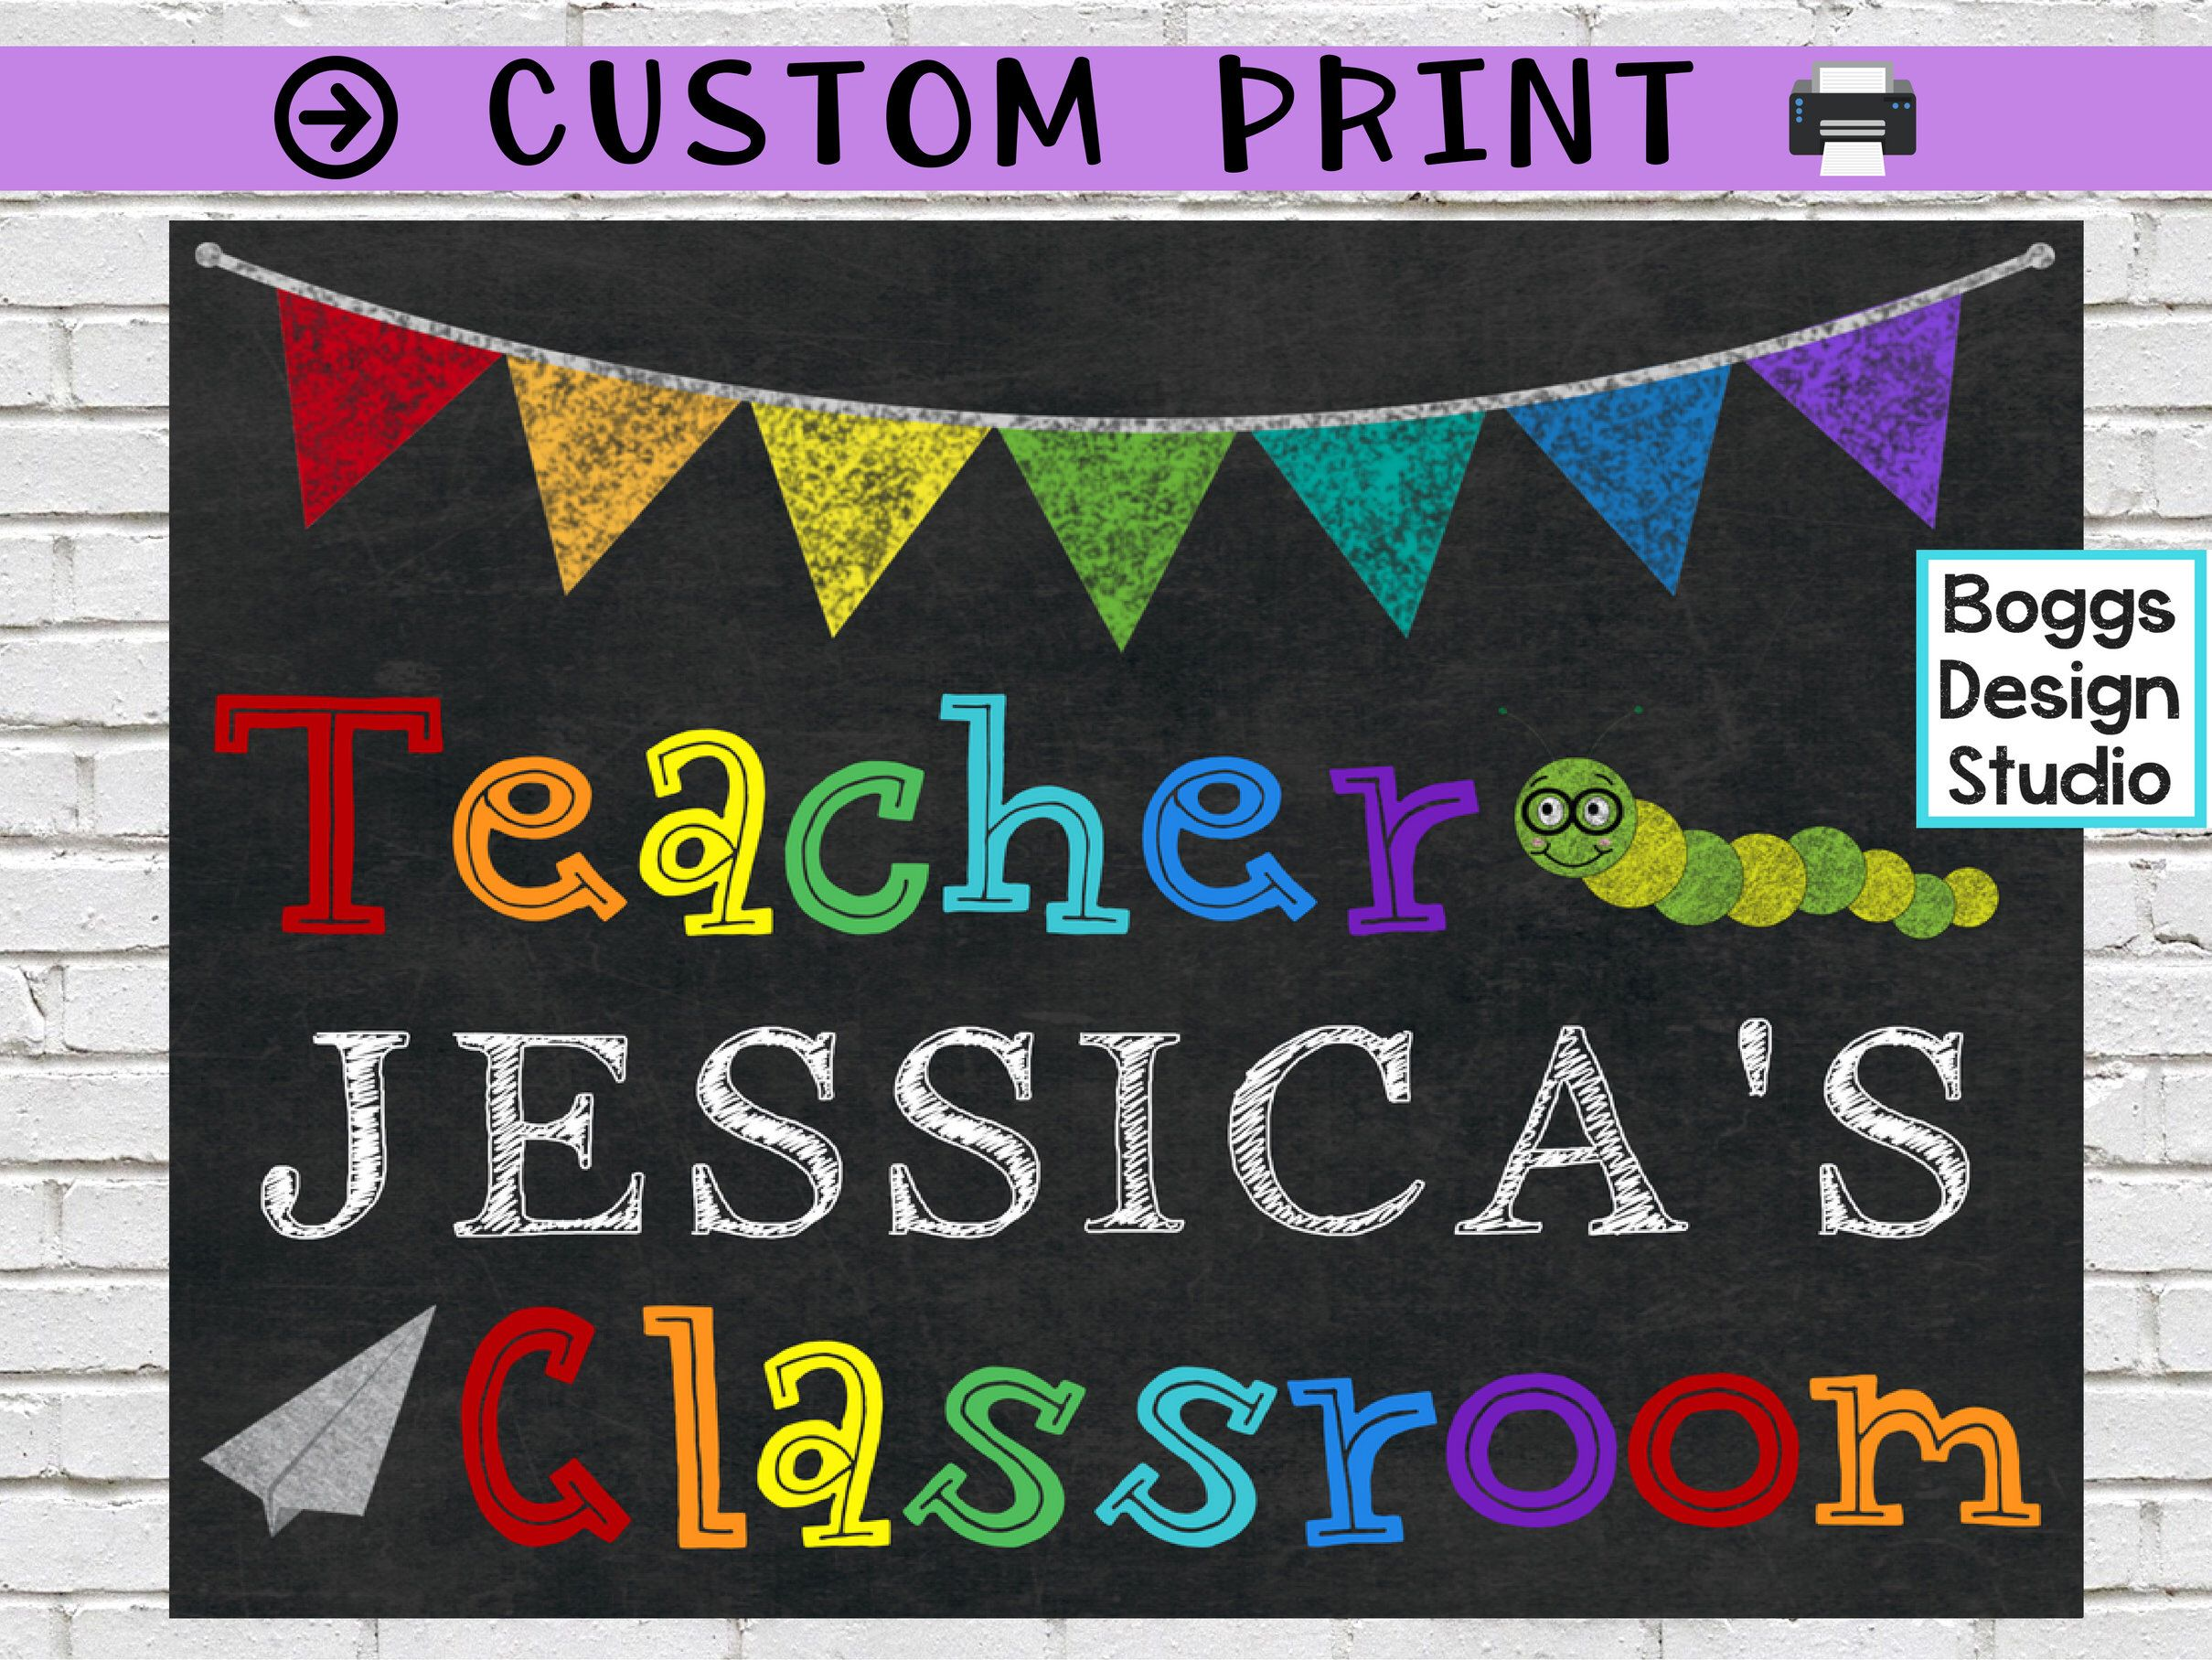 Gogokid background Personalize teacher name Magic Ears Custom Name Print Printable Custom sign Vipkid Backdrop Qkids Personalized Name